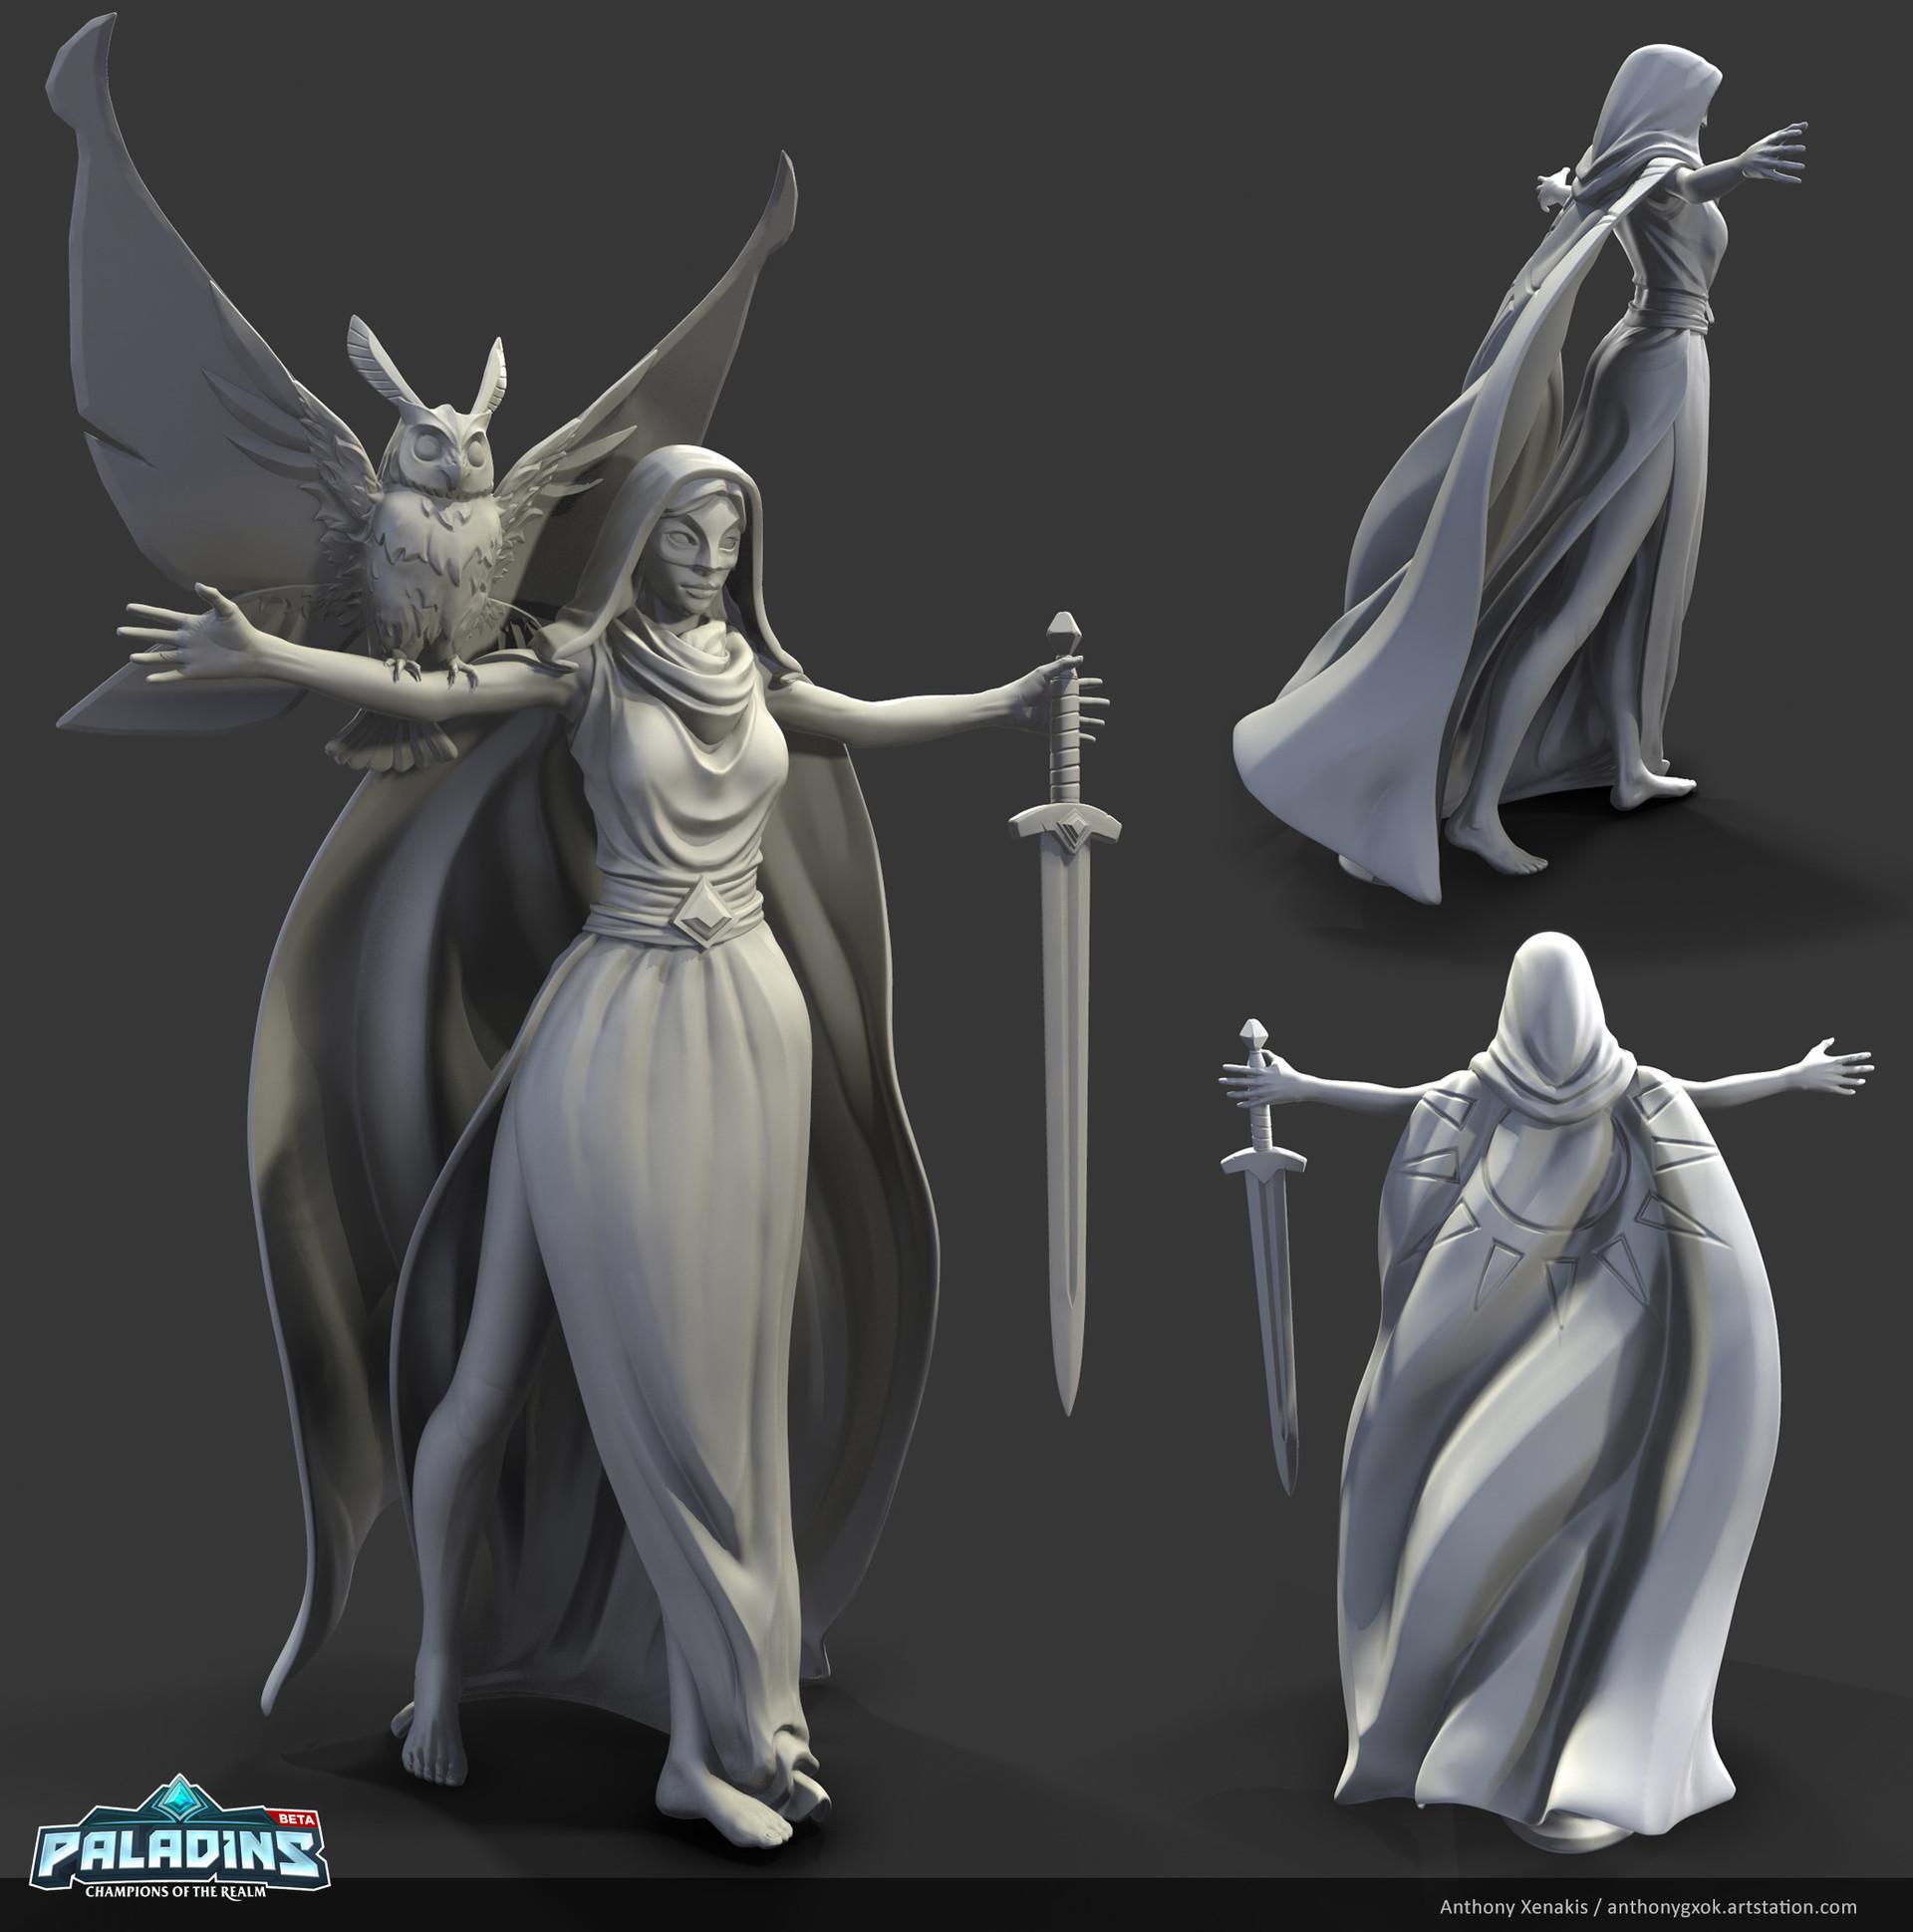 Anthony xenakis statuec renders4